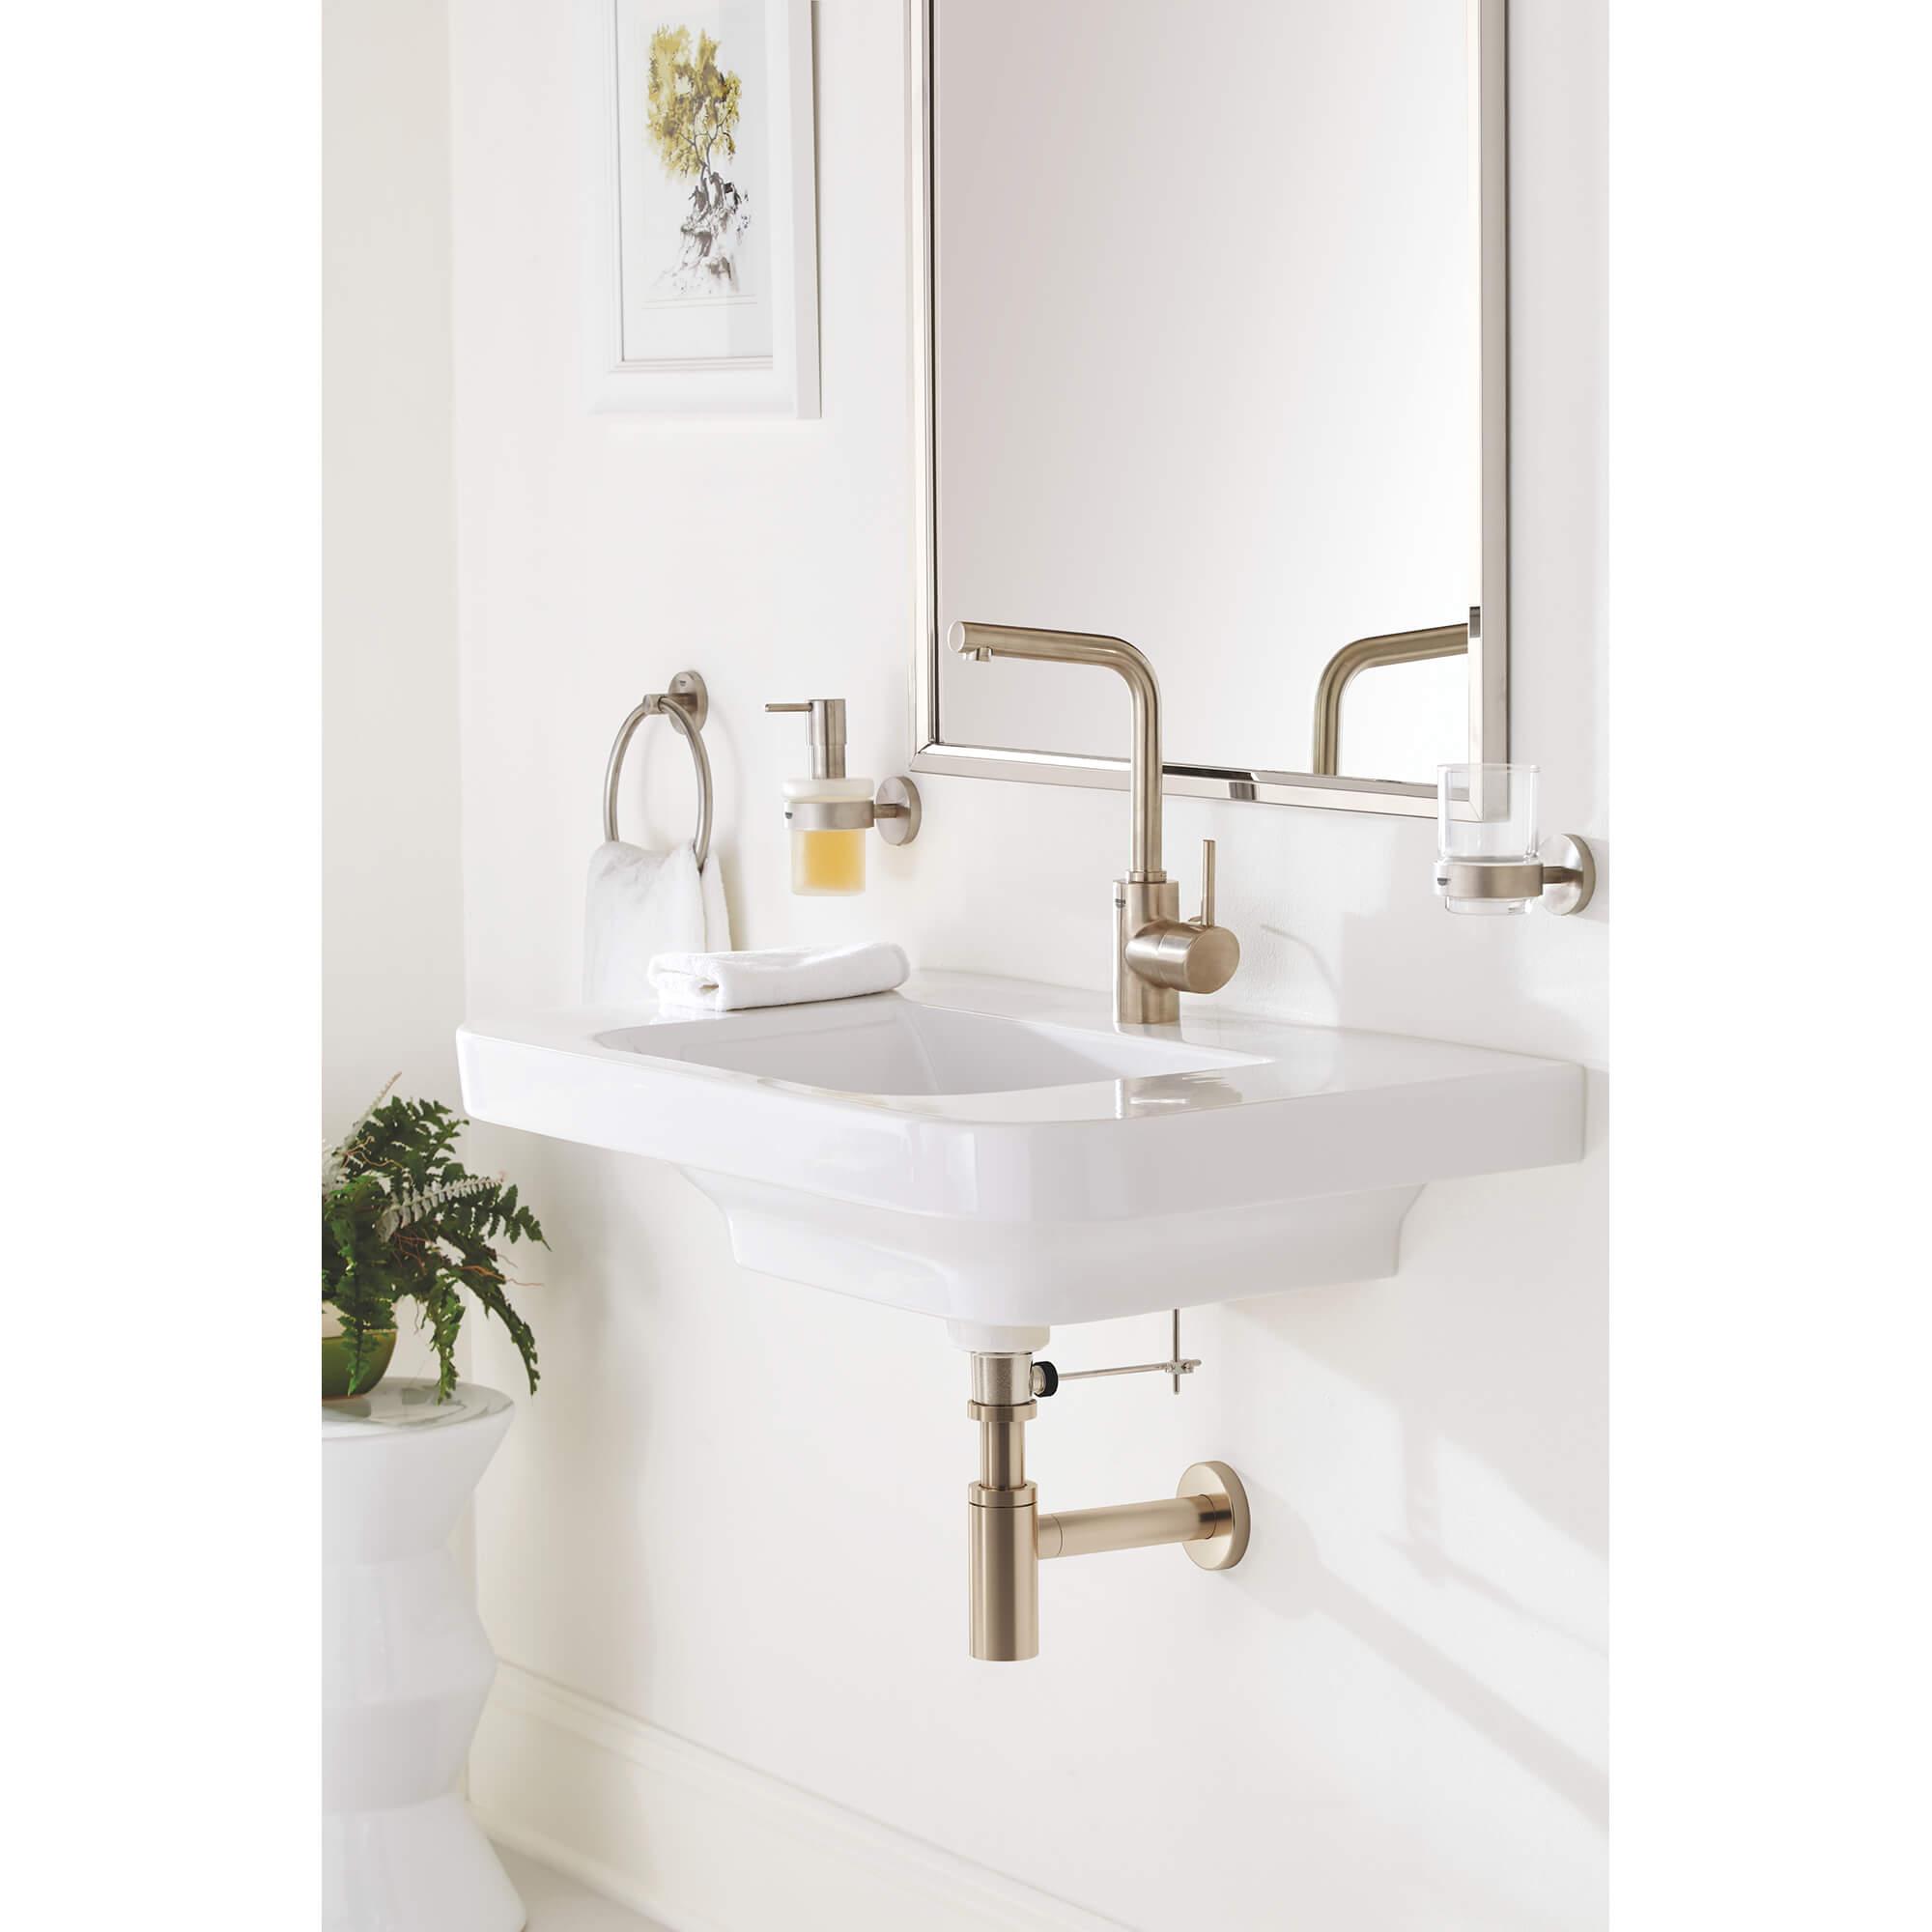 single hole single handle l size bathroom faucet 4 5 l min 1 2 gpm